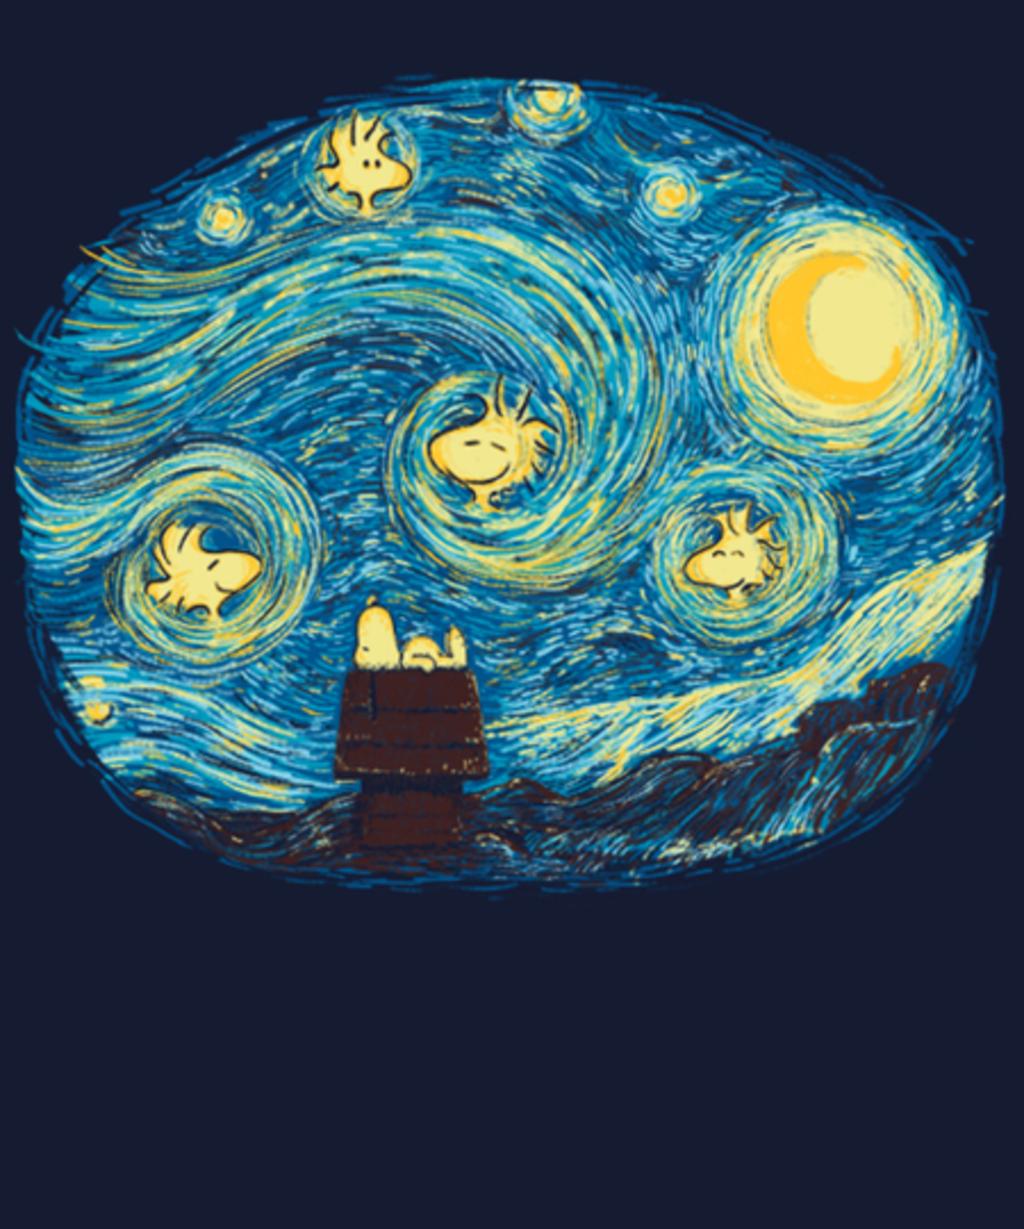 Qwertee: Beagle night